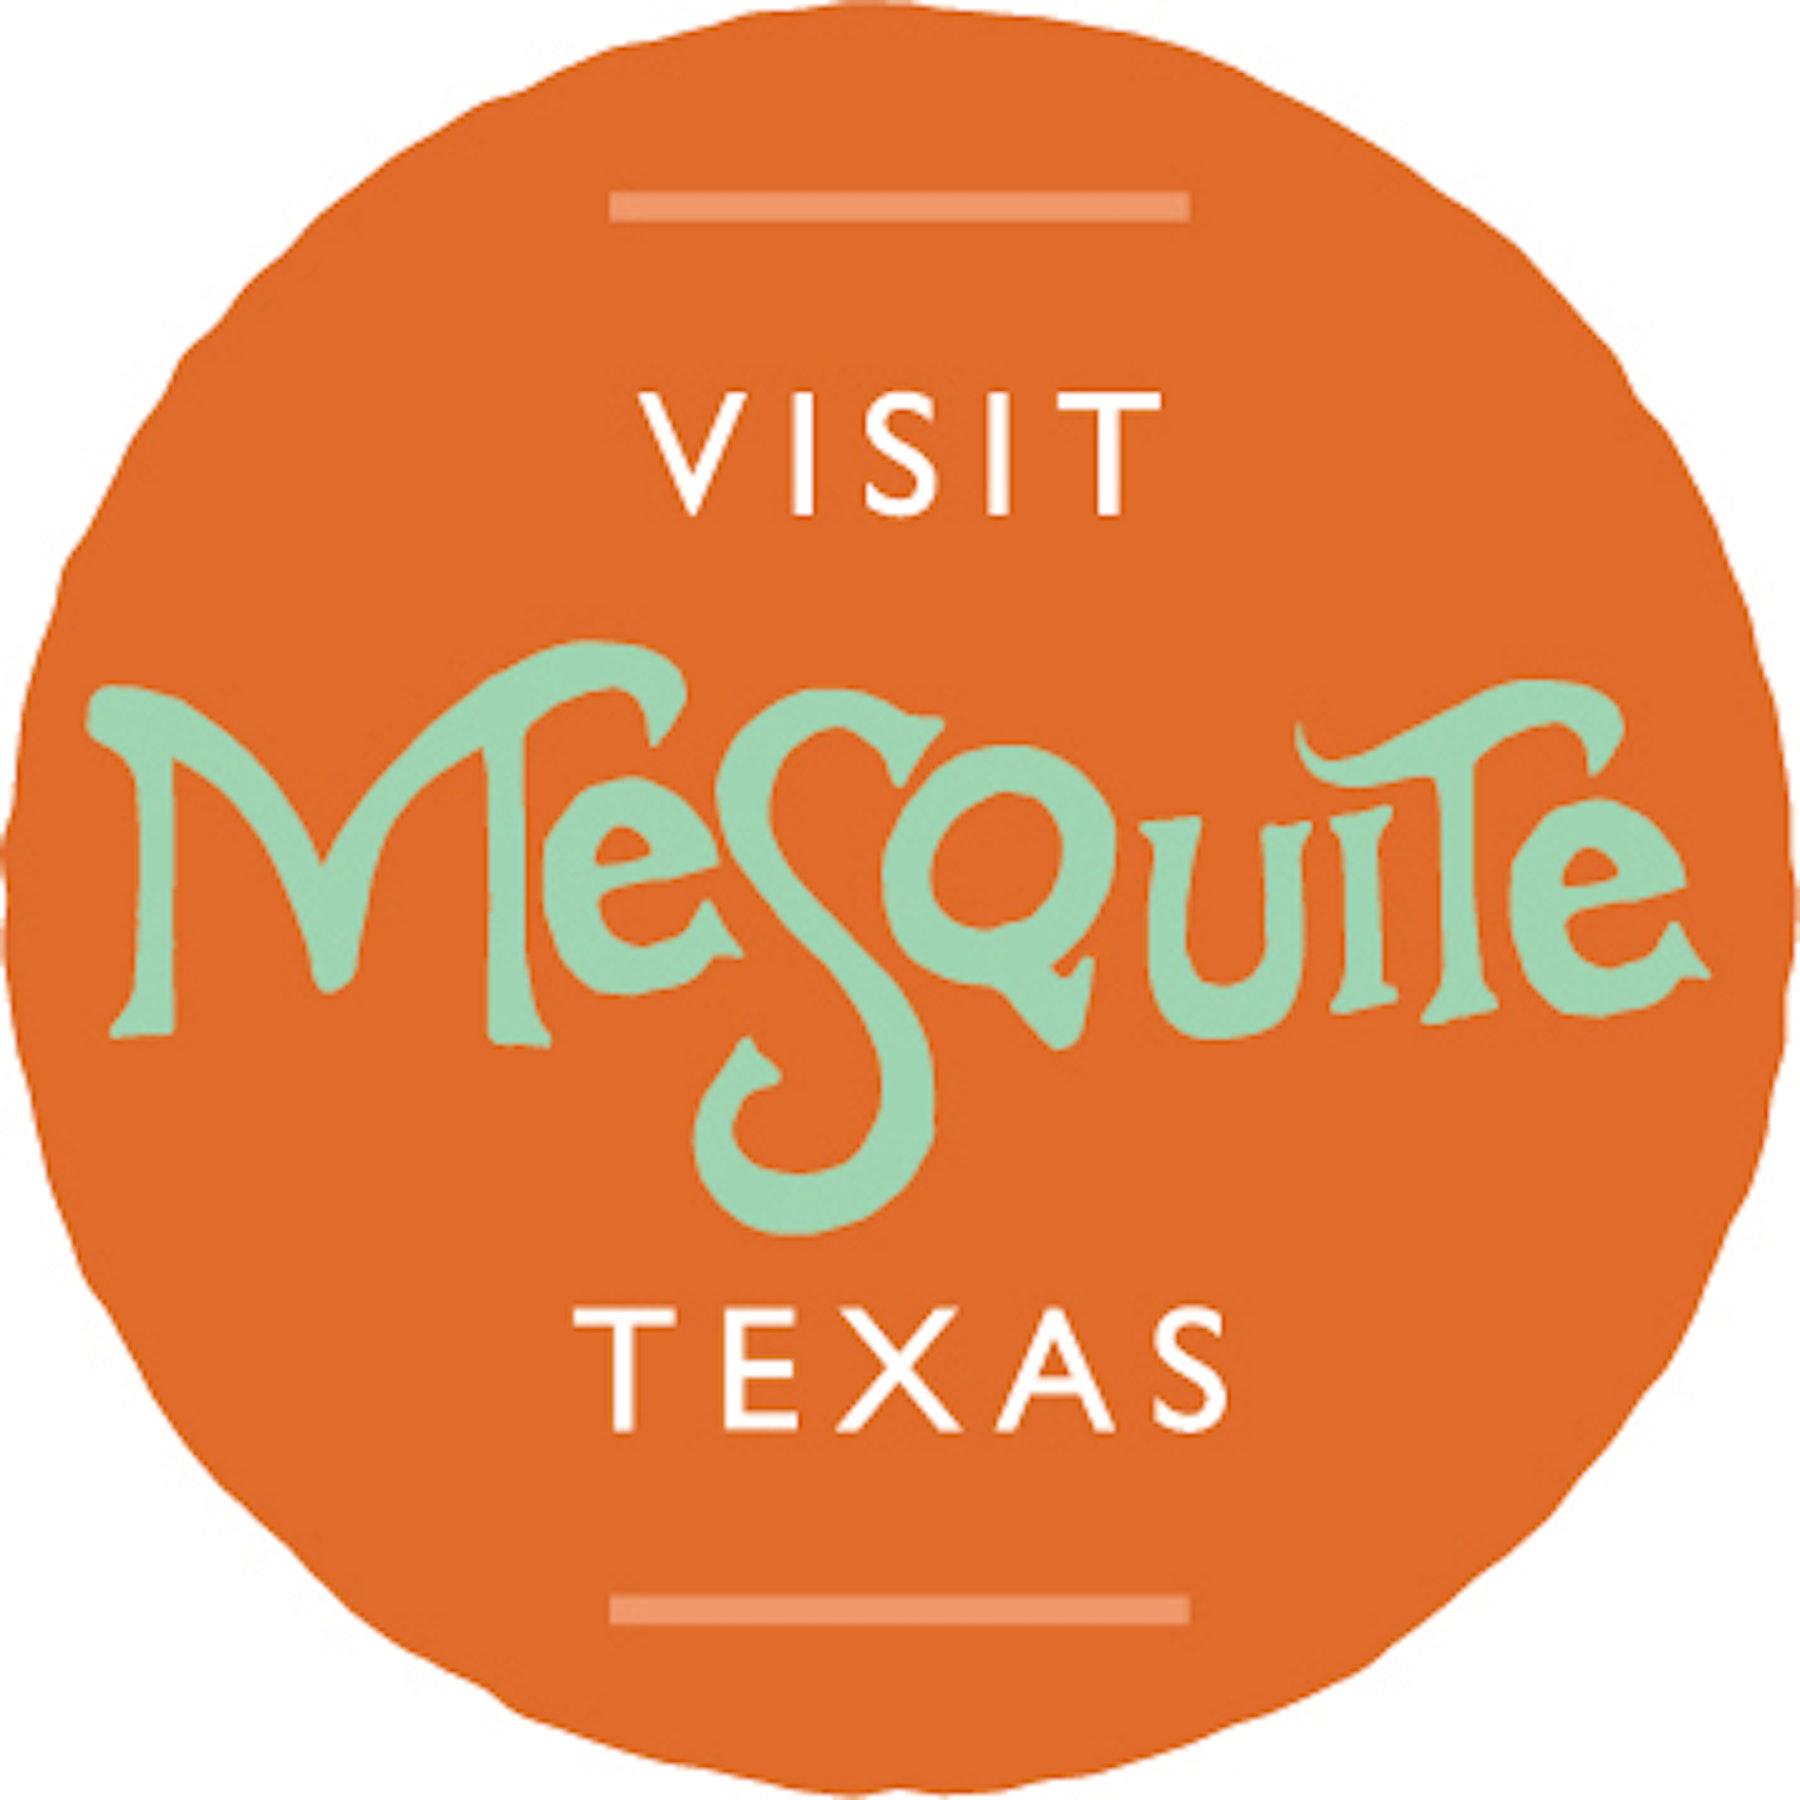 Visit Mesquite Texas in Beyond Dallas